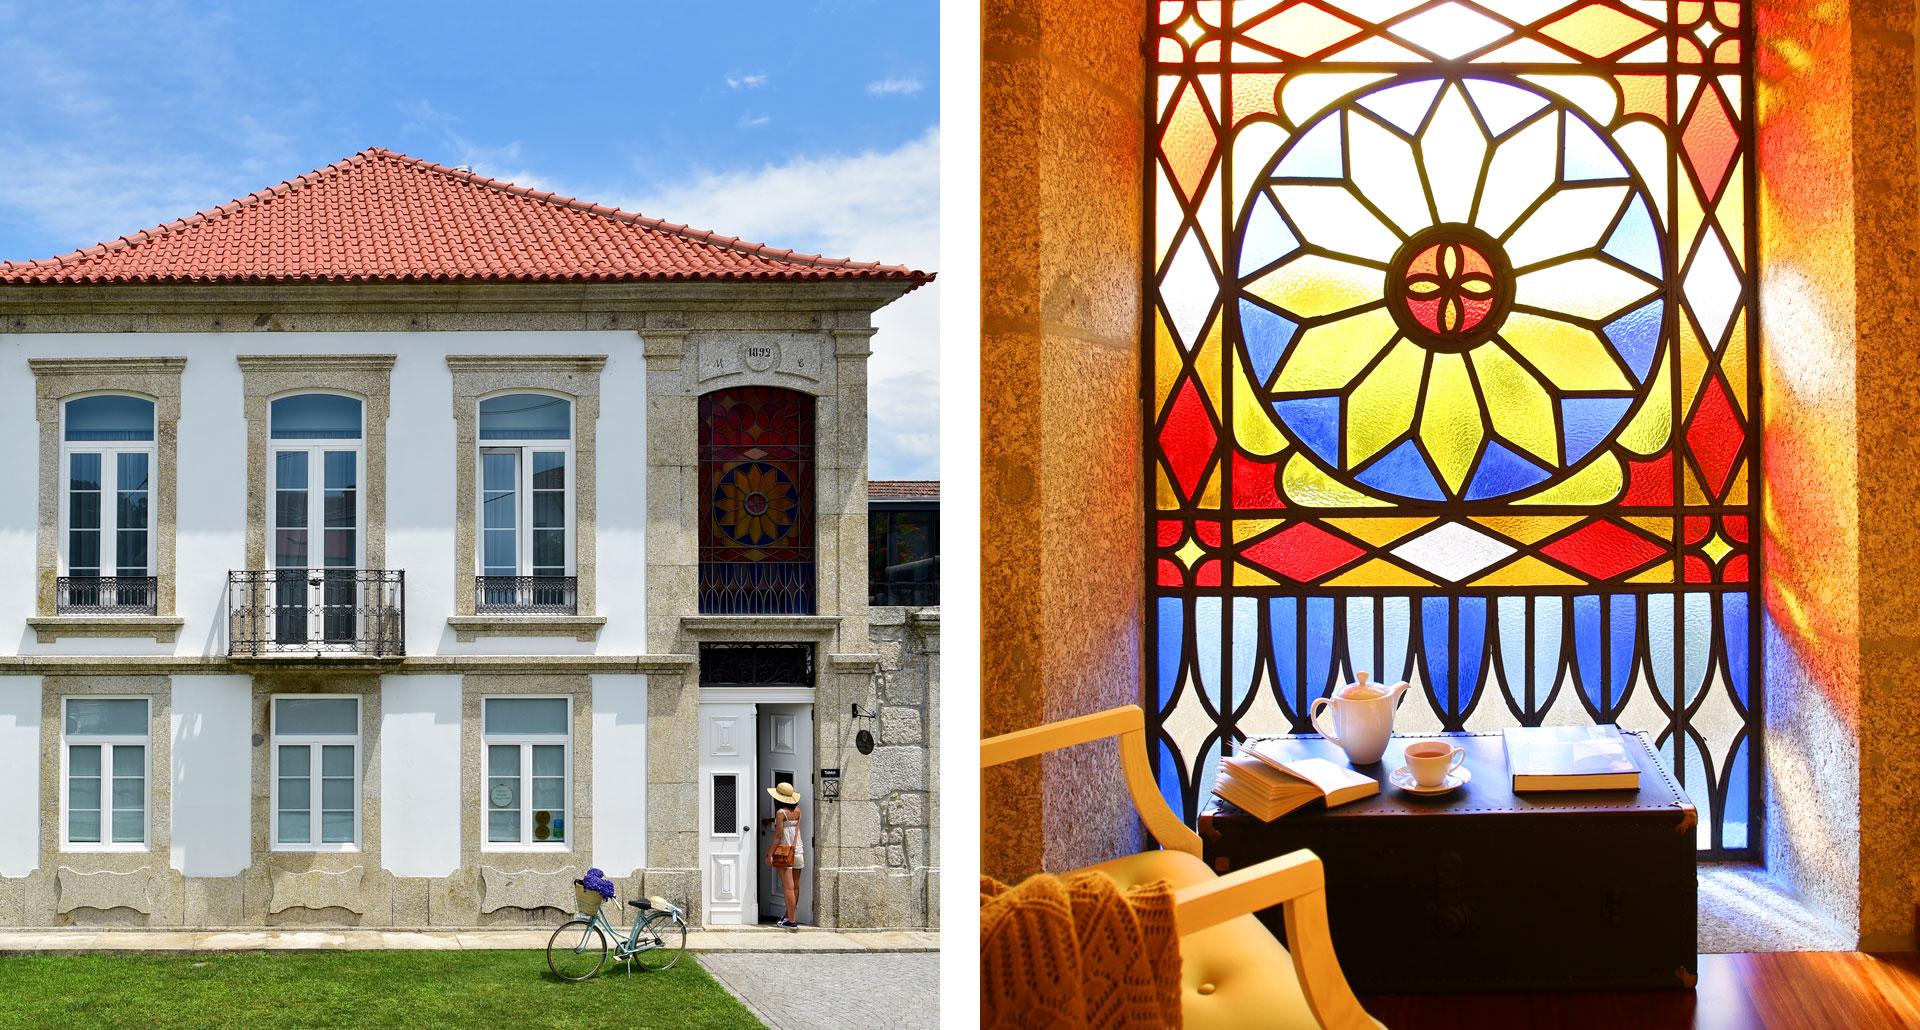 Solar Egas Moniz Charming House - boutique hotel in Penafiel